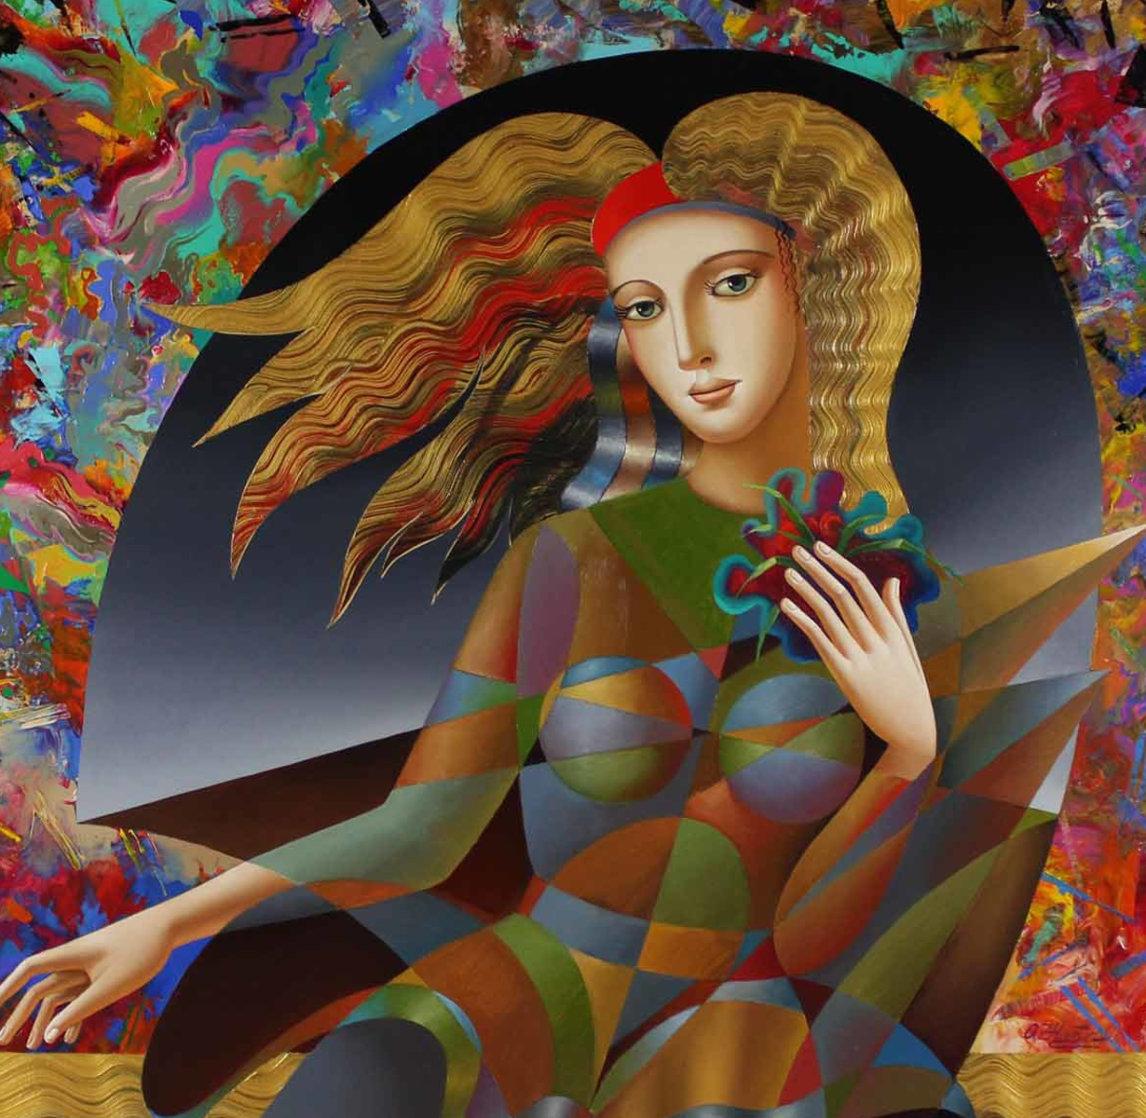 Flower Child 43x43 Super Huge Original Painting by Oleg Zhivetin